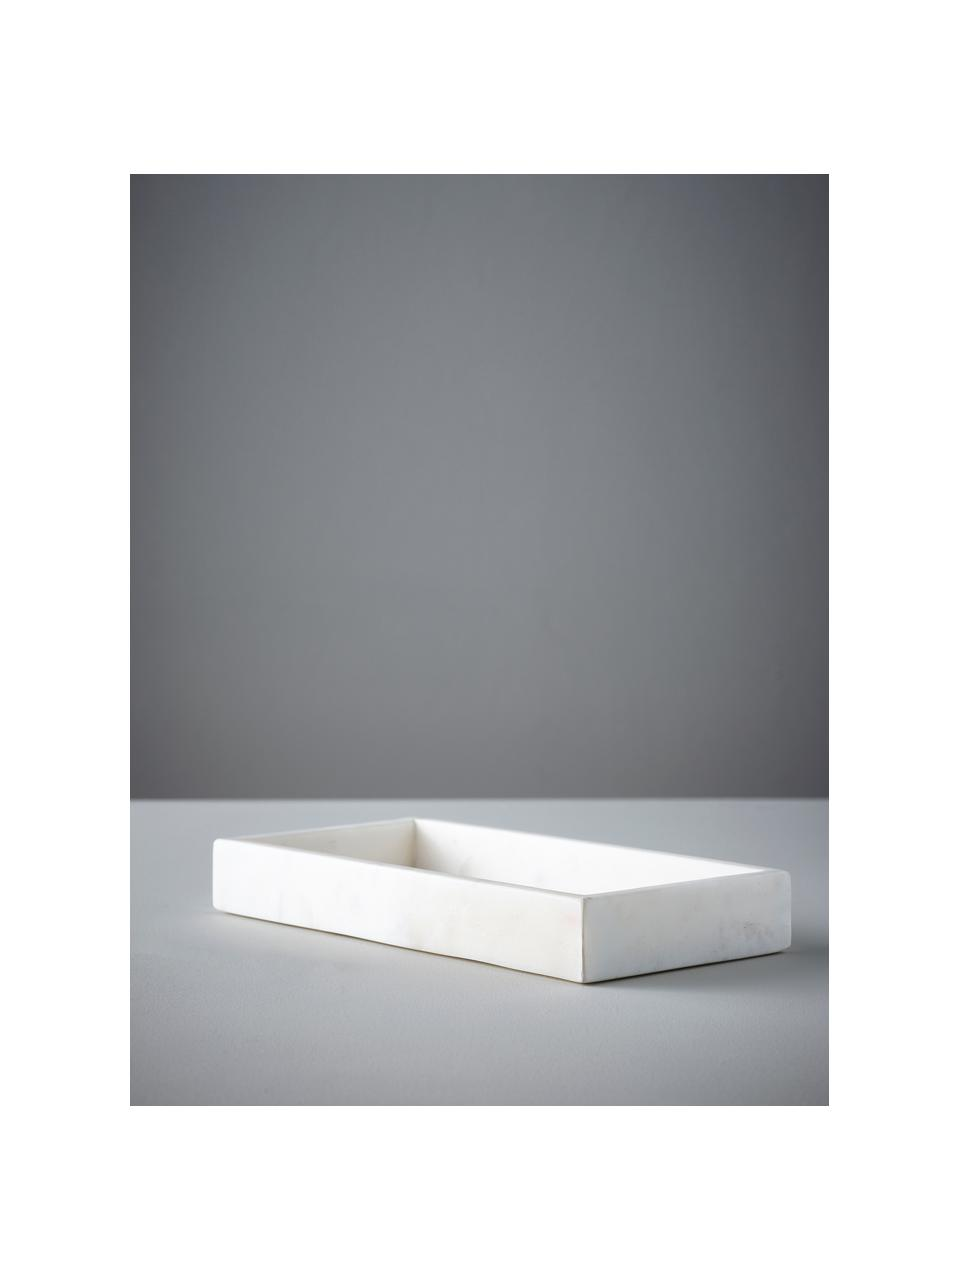 Deko-Tablett Bifrost, Marmor, Weiß, 30 x 4 cm